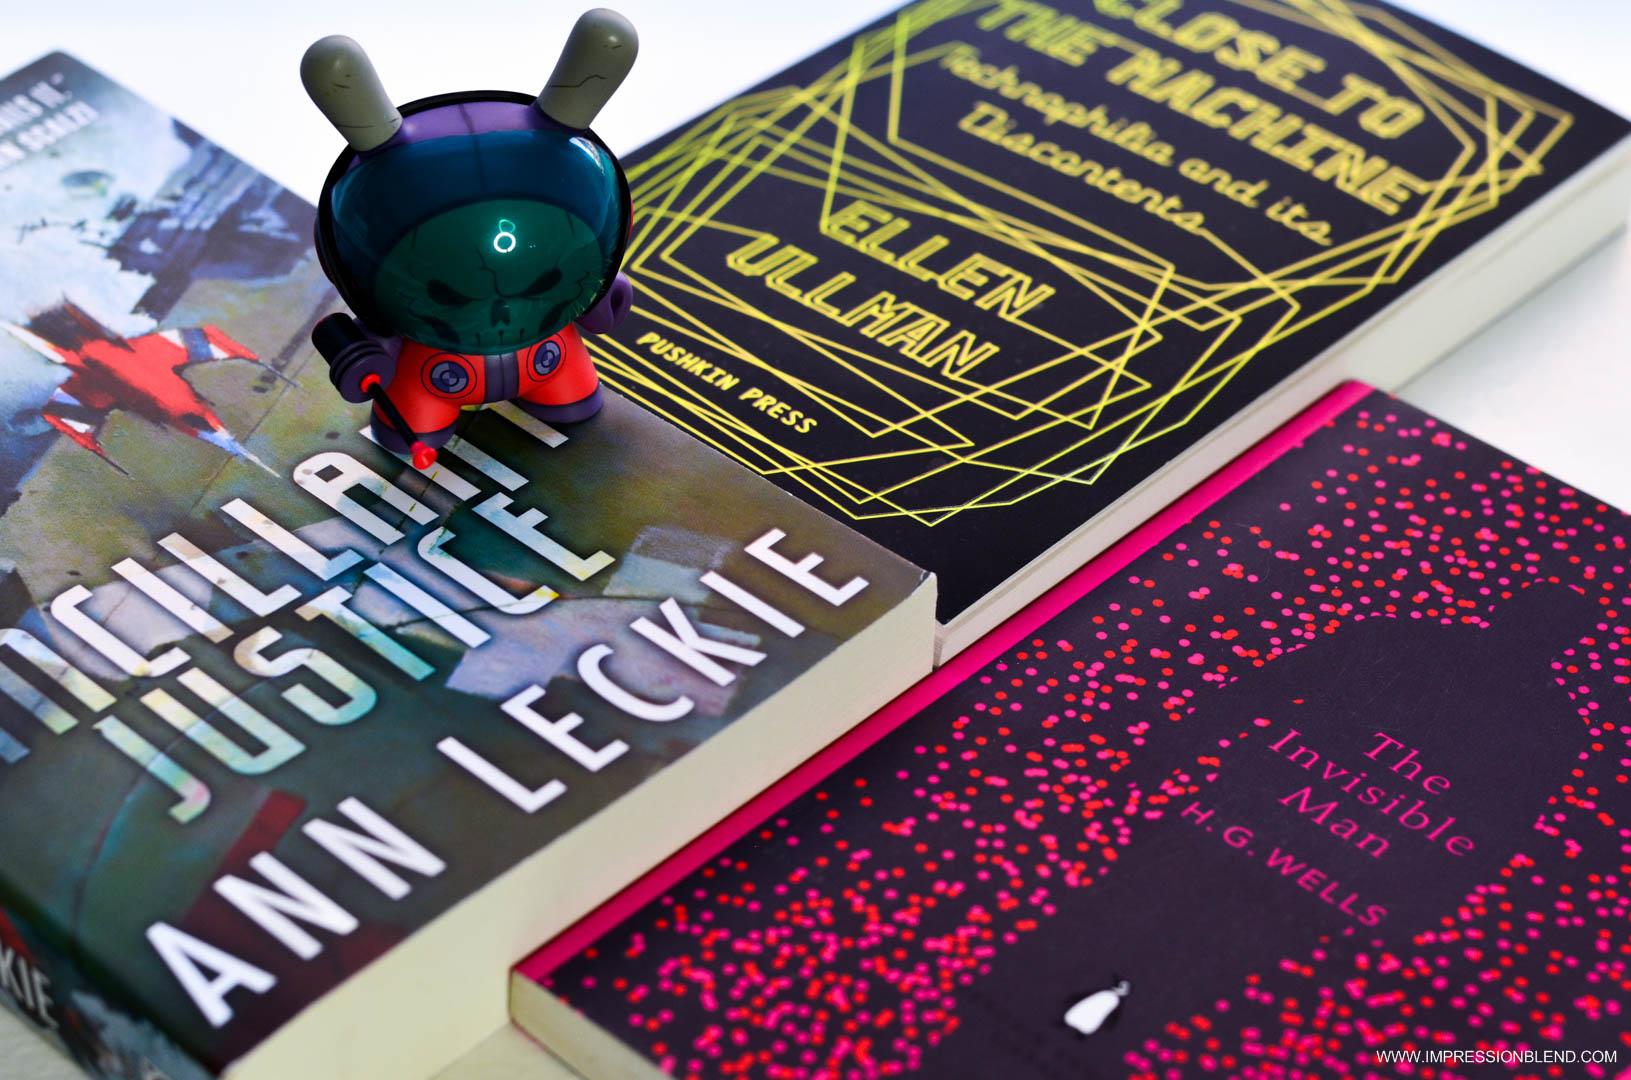 March Book Haul 2015 - memoir and sci-fi